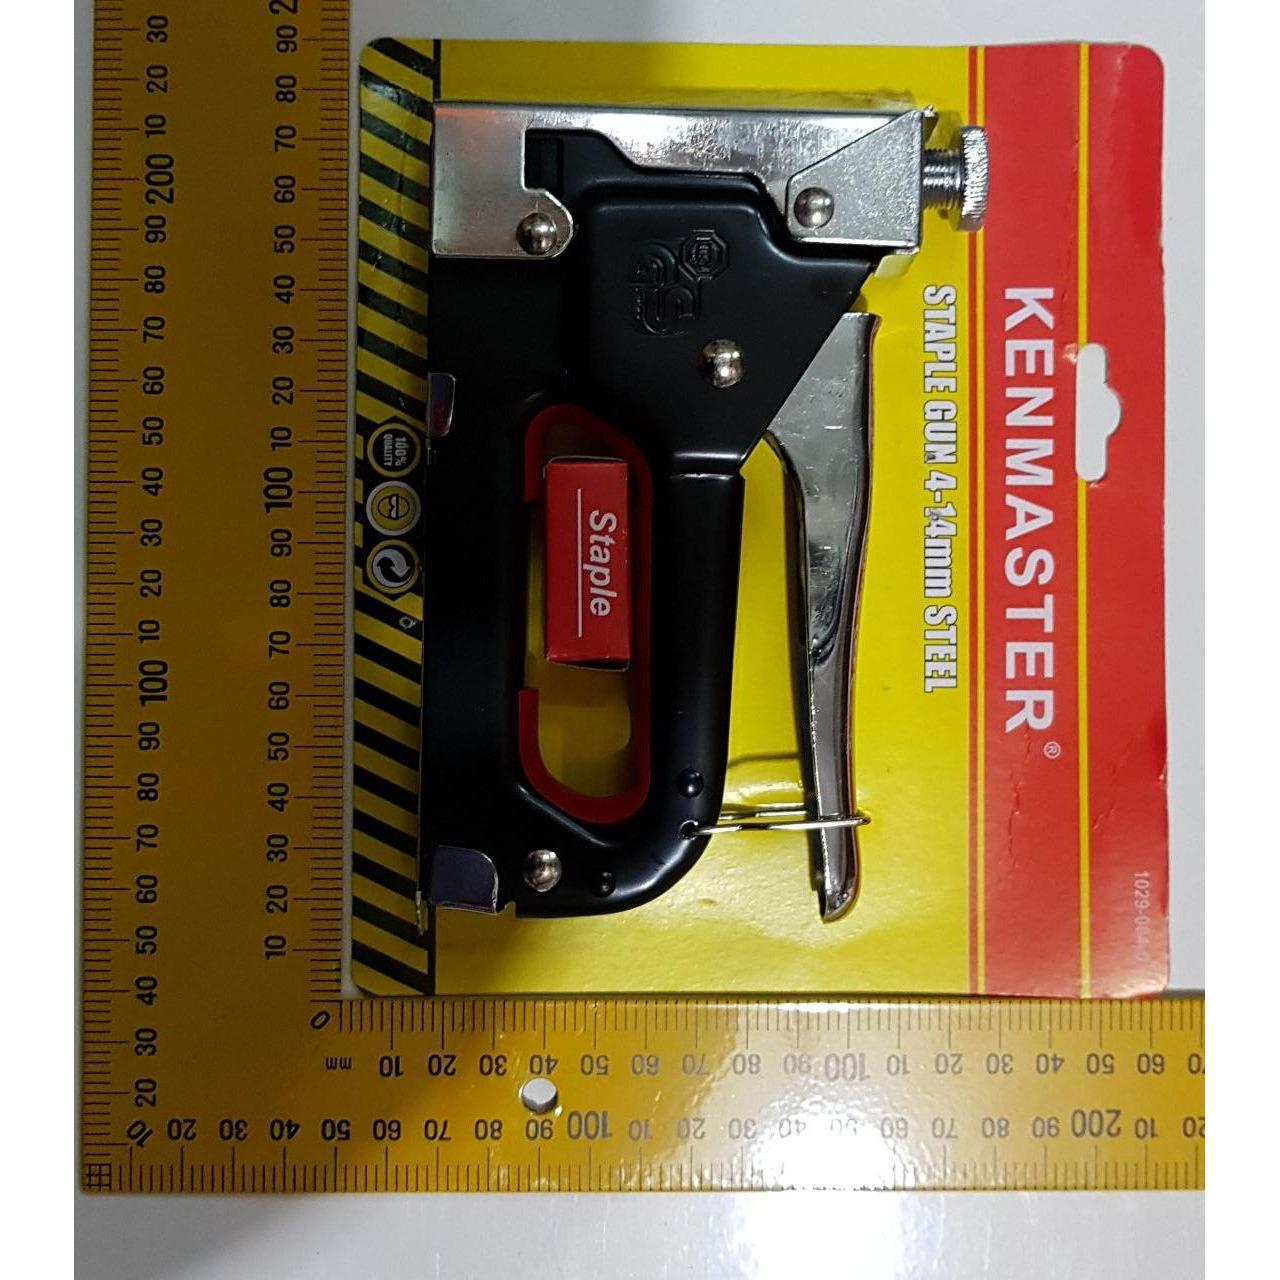 Beli Besar Kenmaster Staples Tembak Gun Staple Kenmaster 4 14 Mm Jok Pake Kartu Kredit